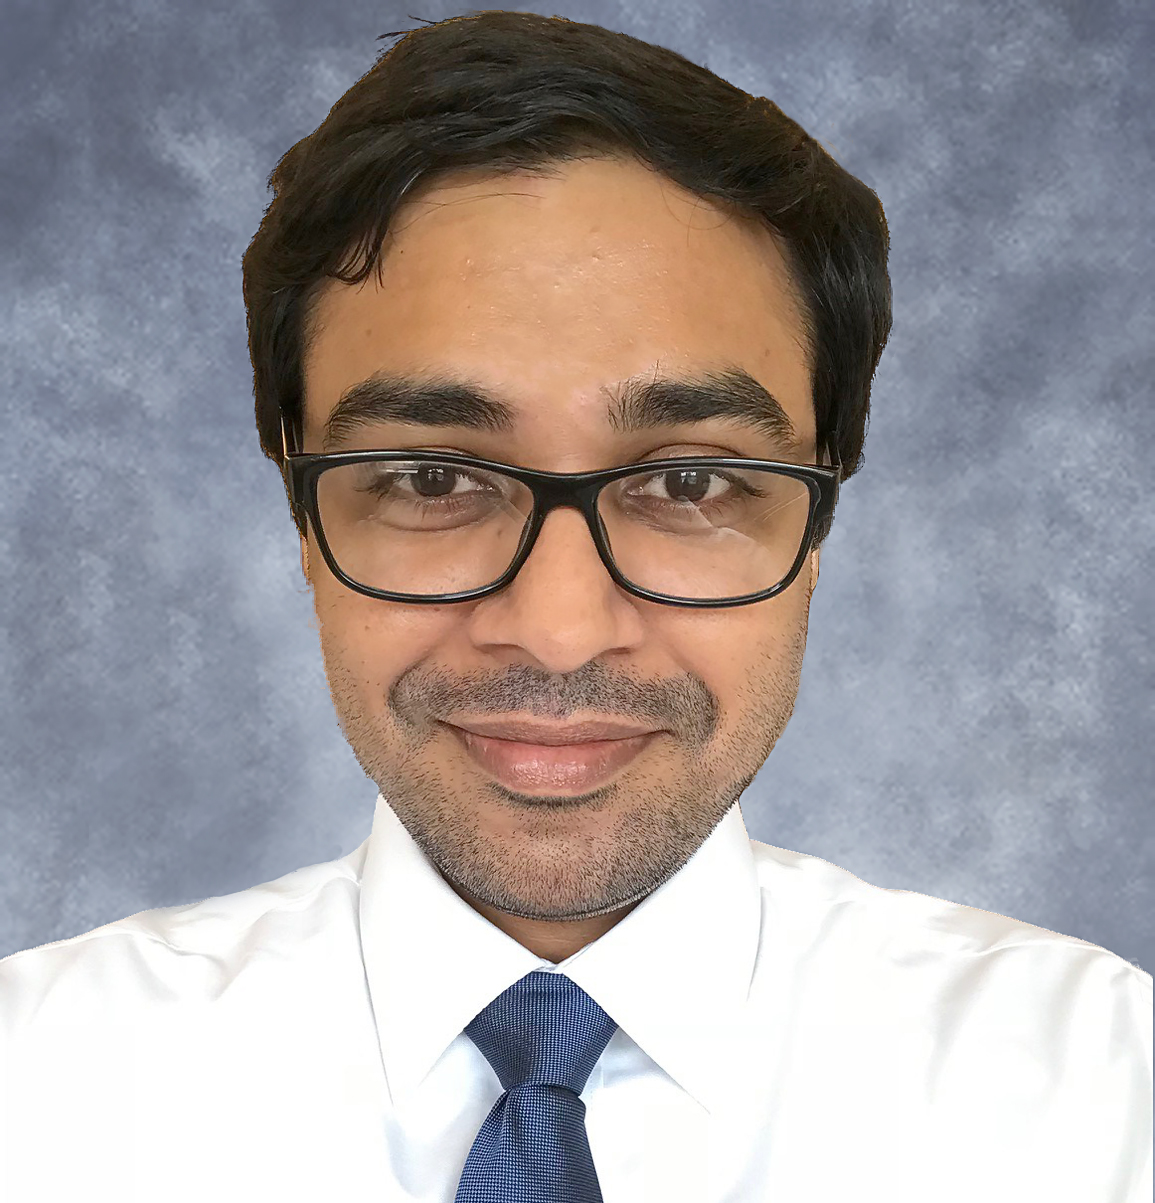 Theekshana Fernando, MBBS, MPH